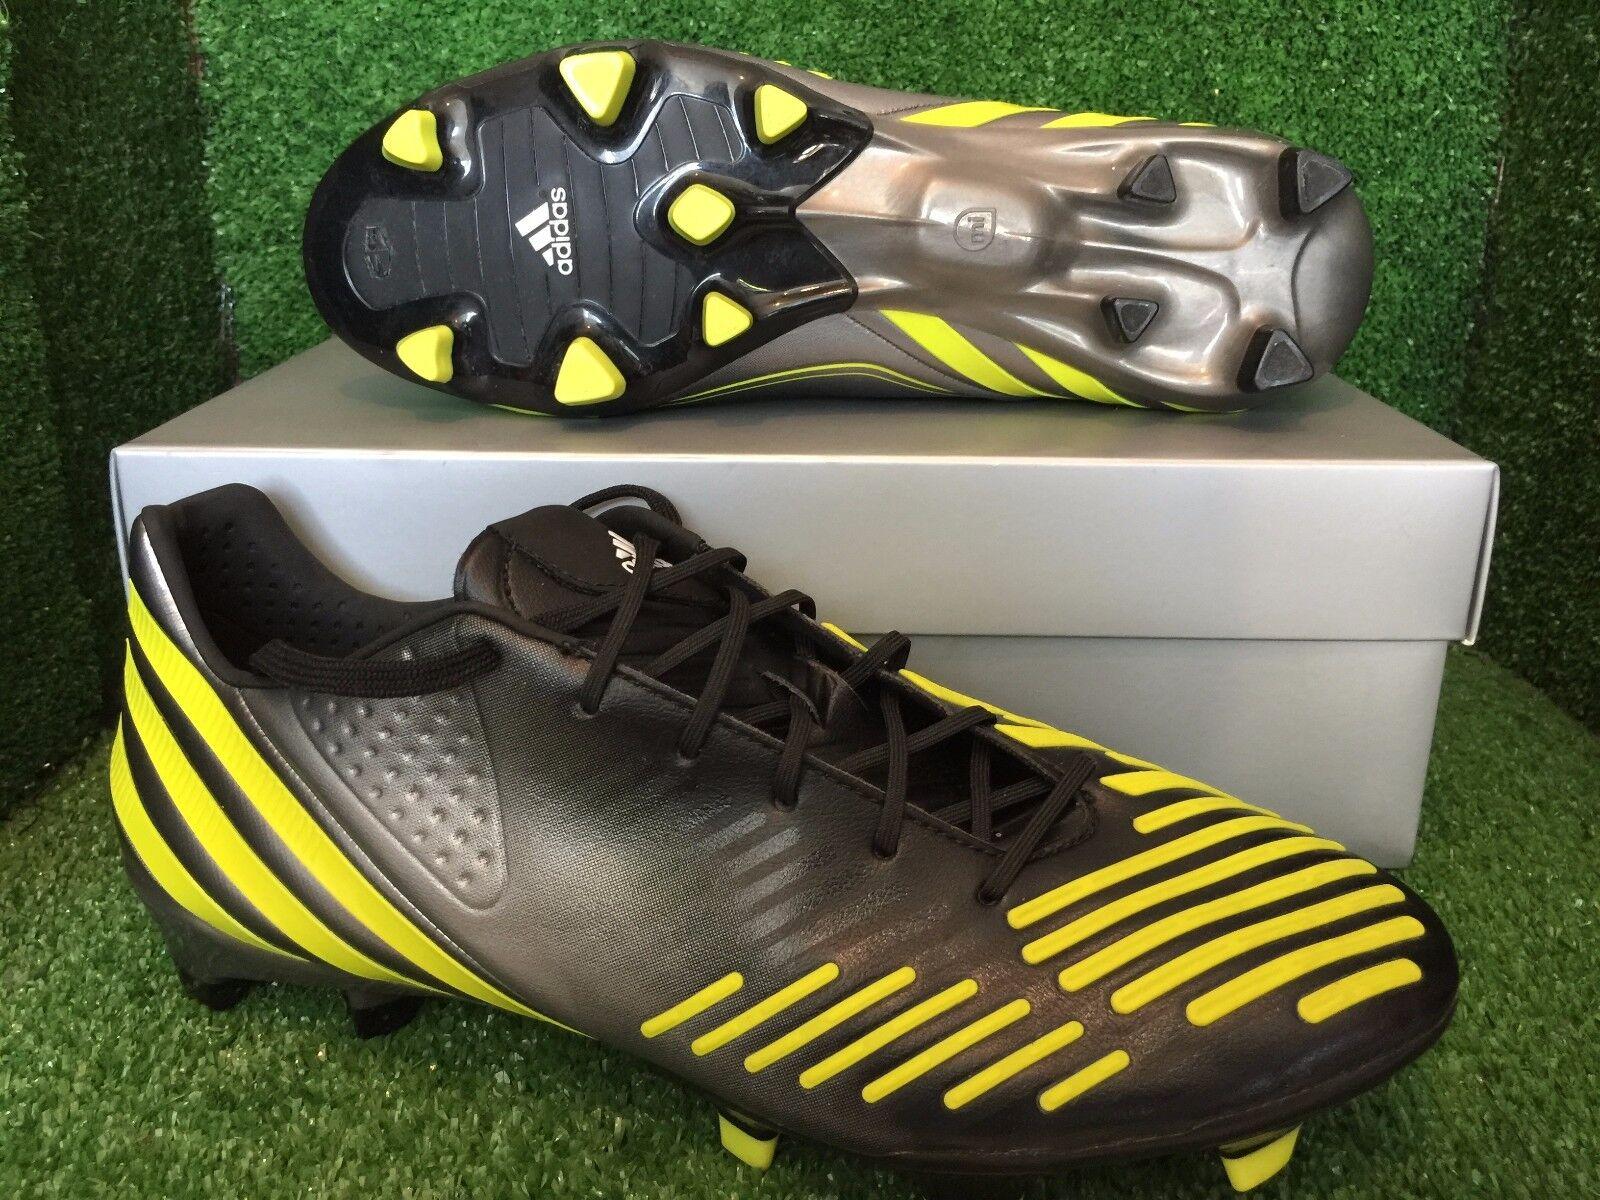 BN Adidas Protator Gelb Lethal Zone Powerswerve Größe 9 8,5 43